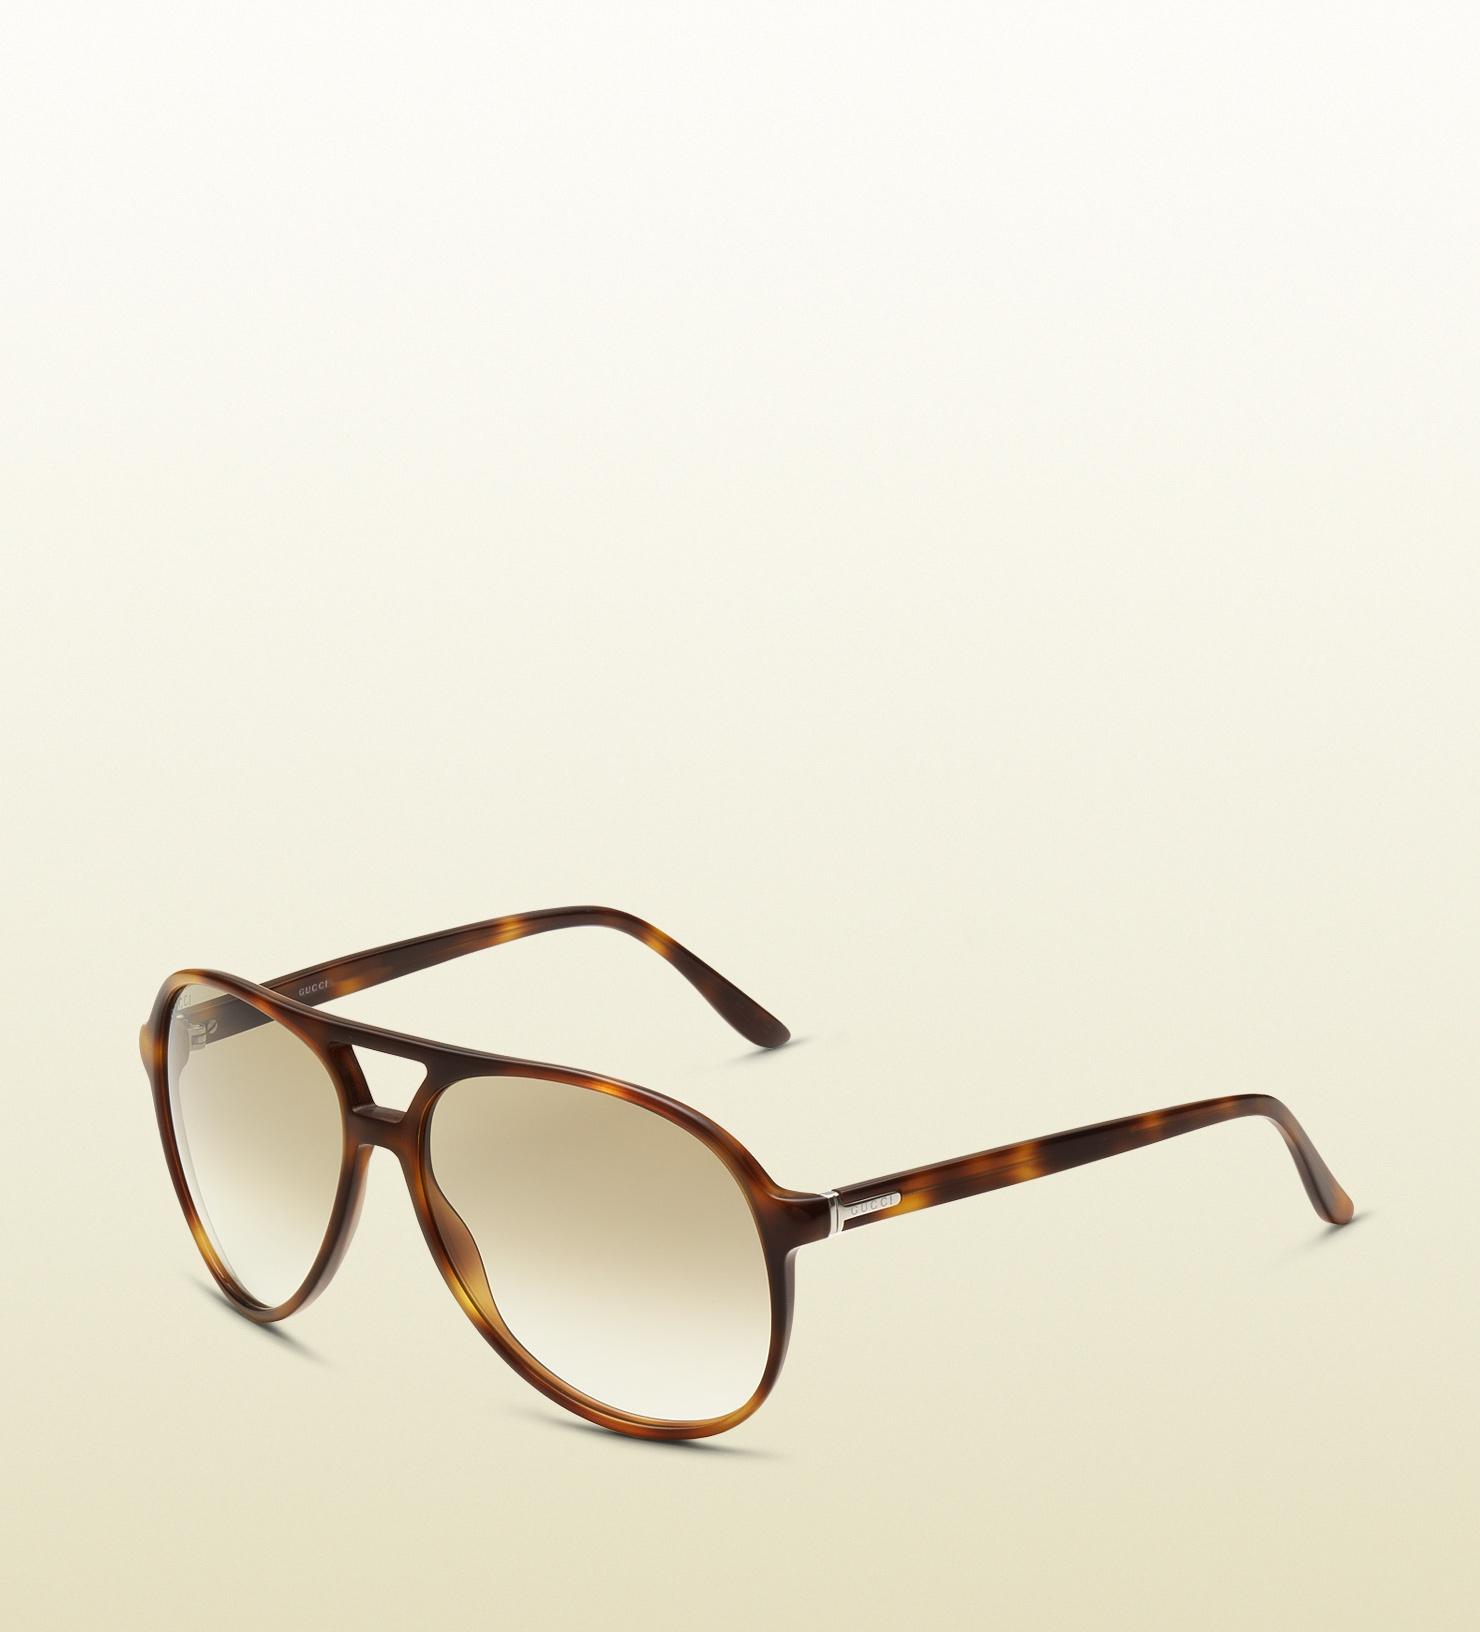 e9d77353c25 Lyst - Gucci Mens Light Havana Aviator Sunglasses in Brown for Men